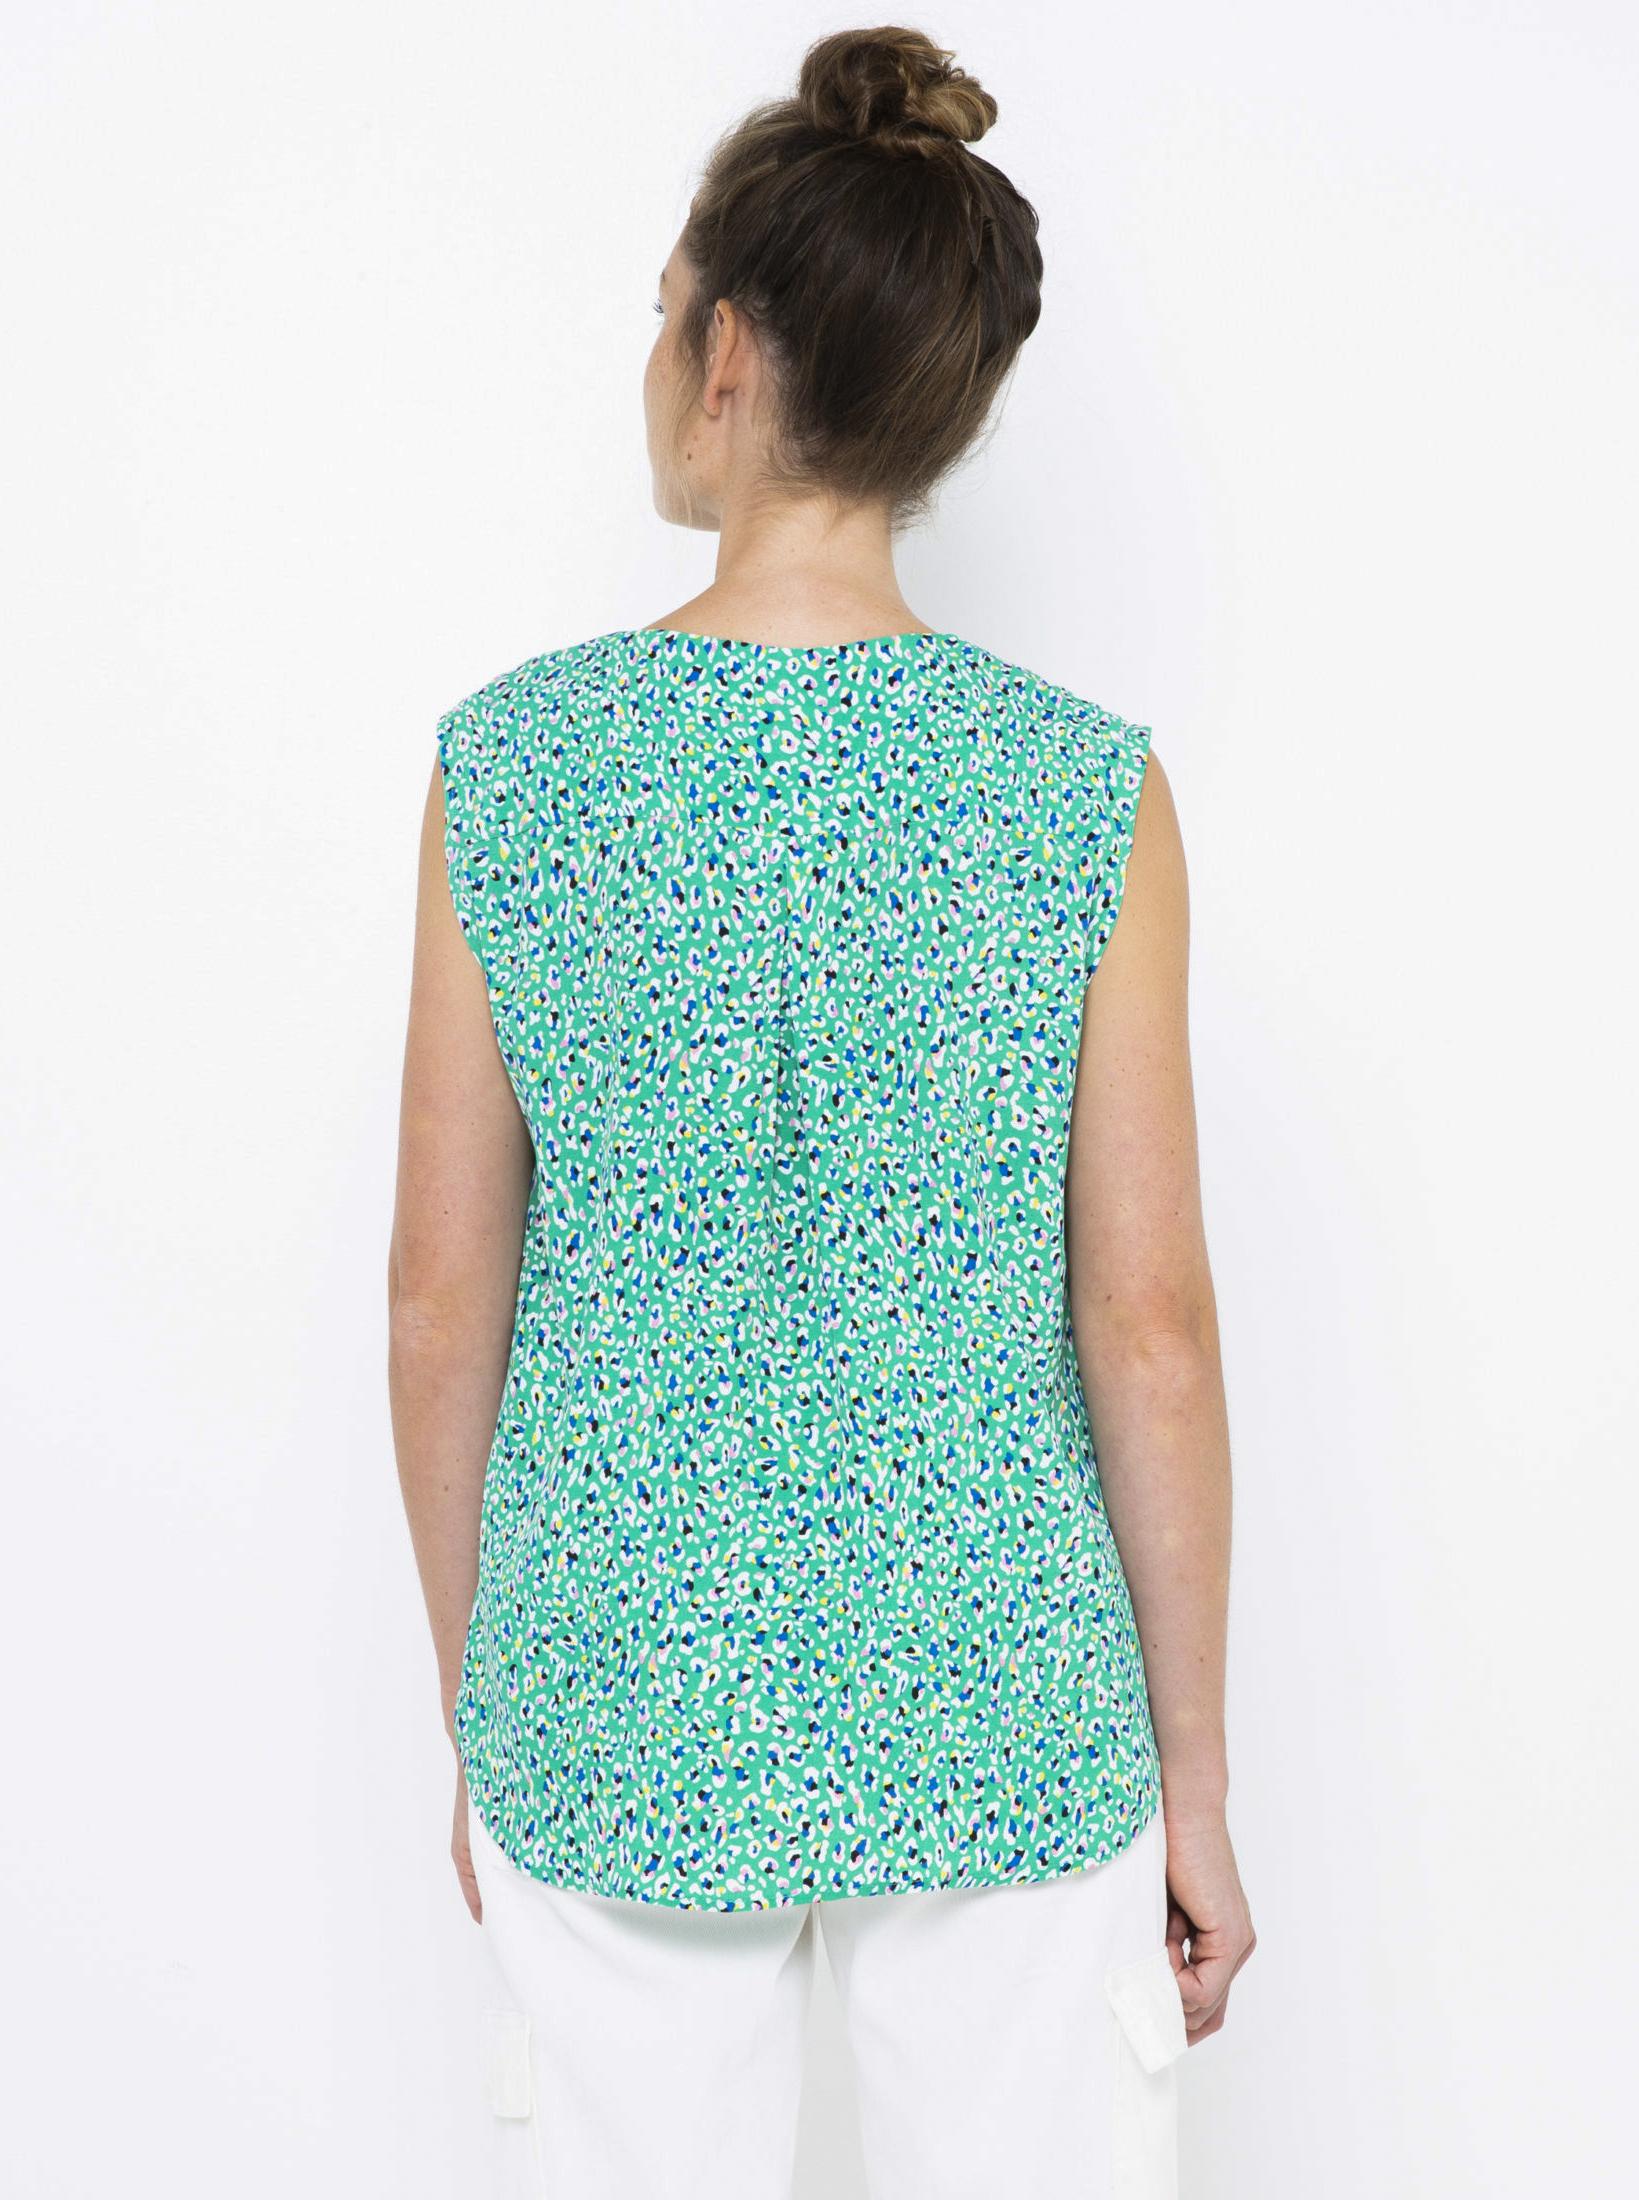 CAMAIEU blue women´s top with pattern